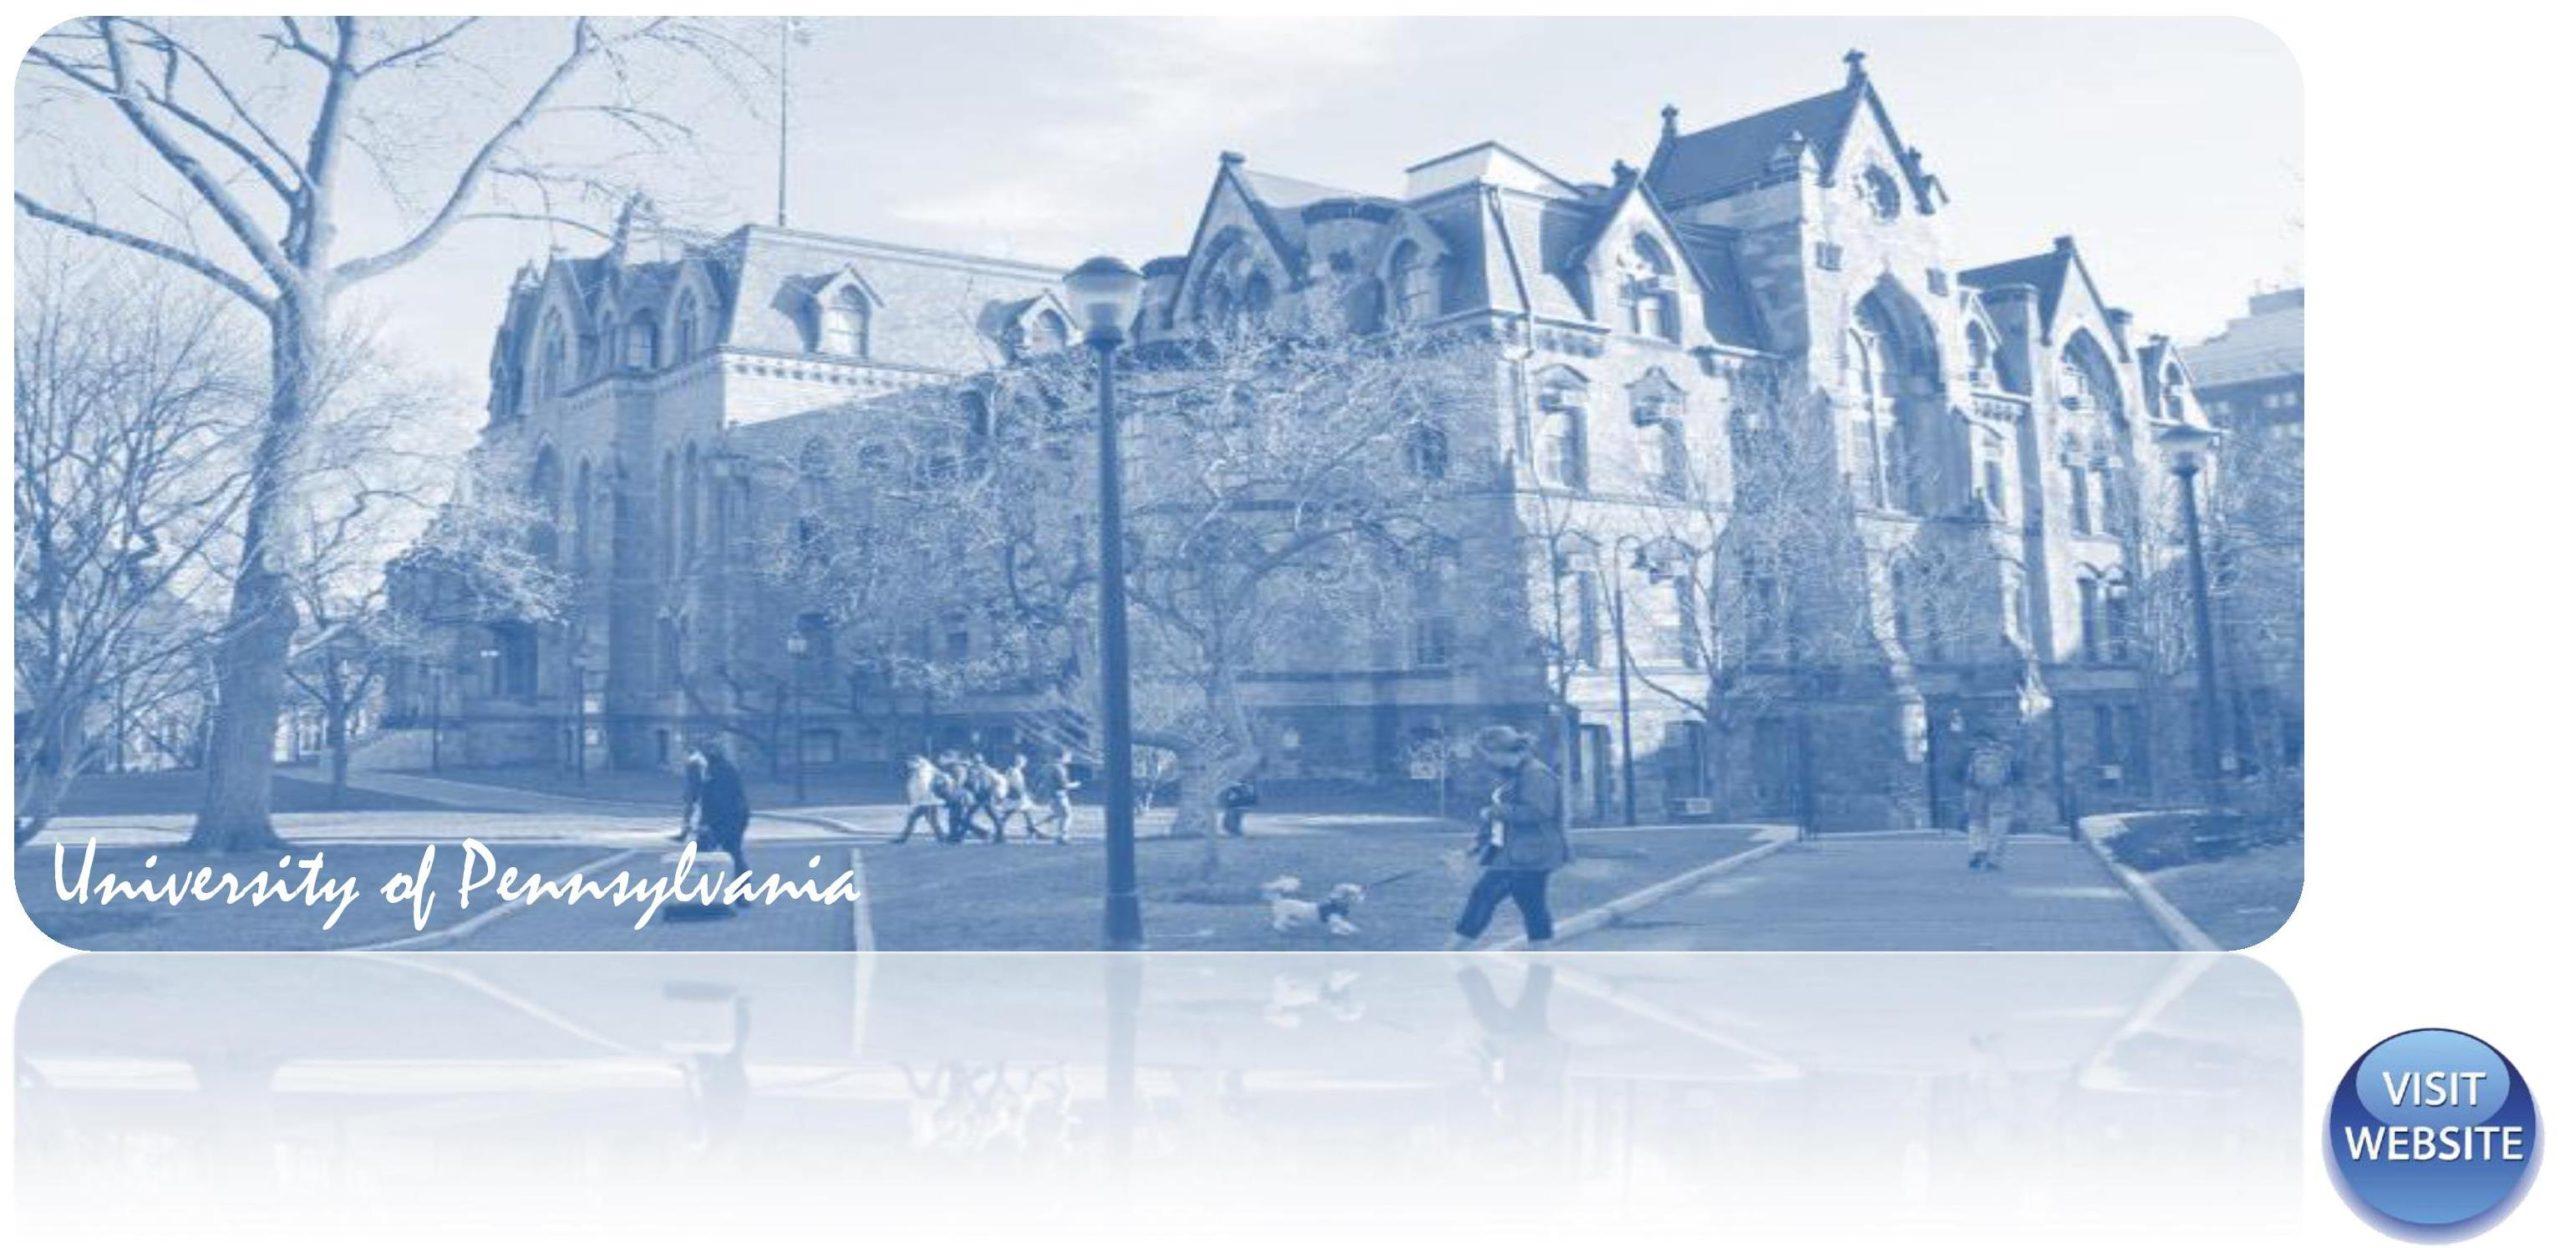 University of Pennsylvania USA